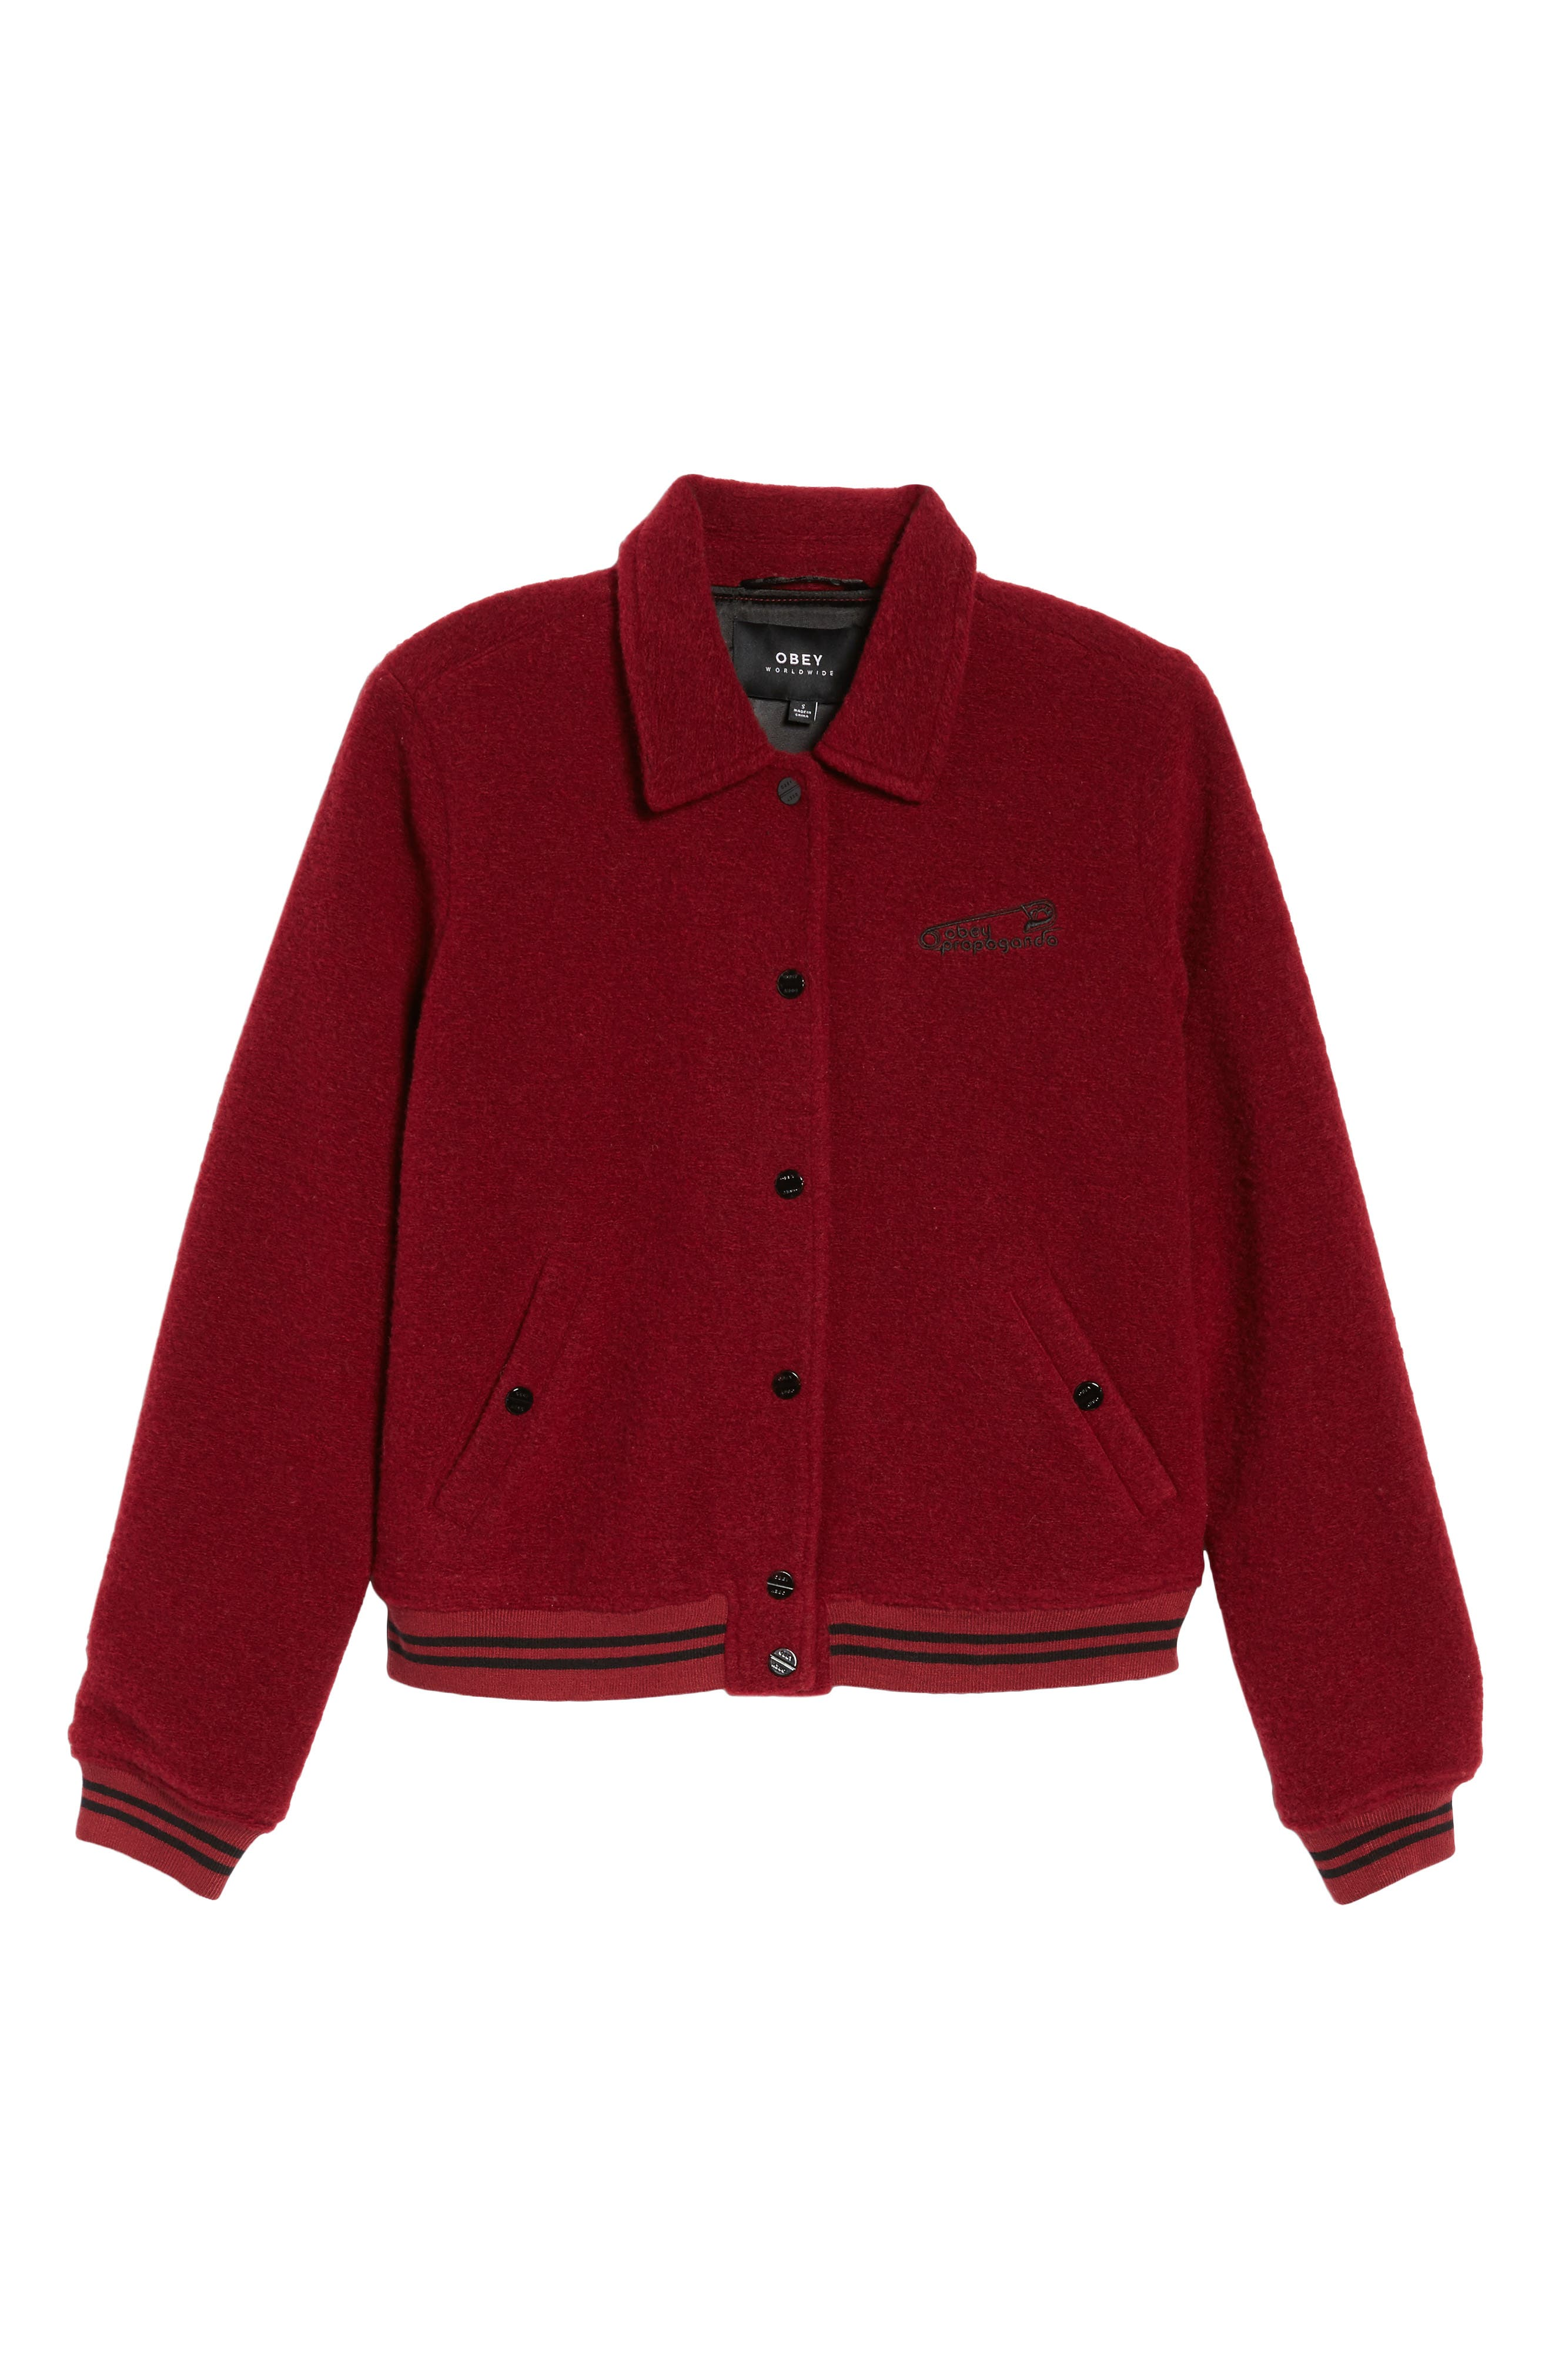 Cambridge Jacket,                             Alternate thumbnail 5, color,                             930